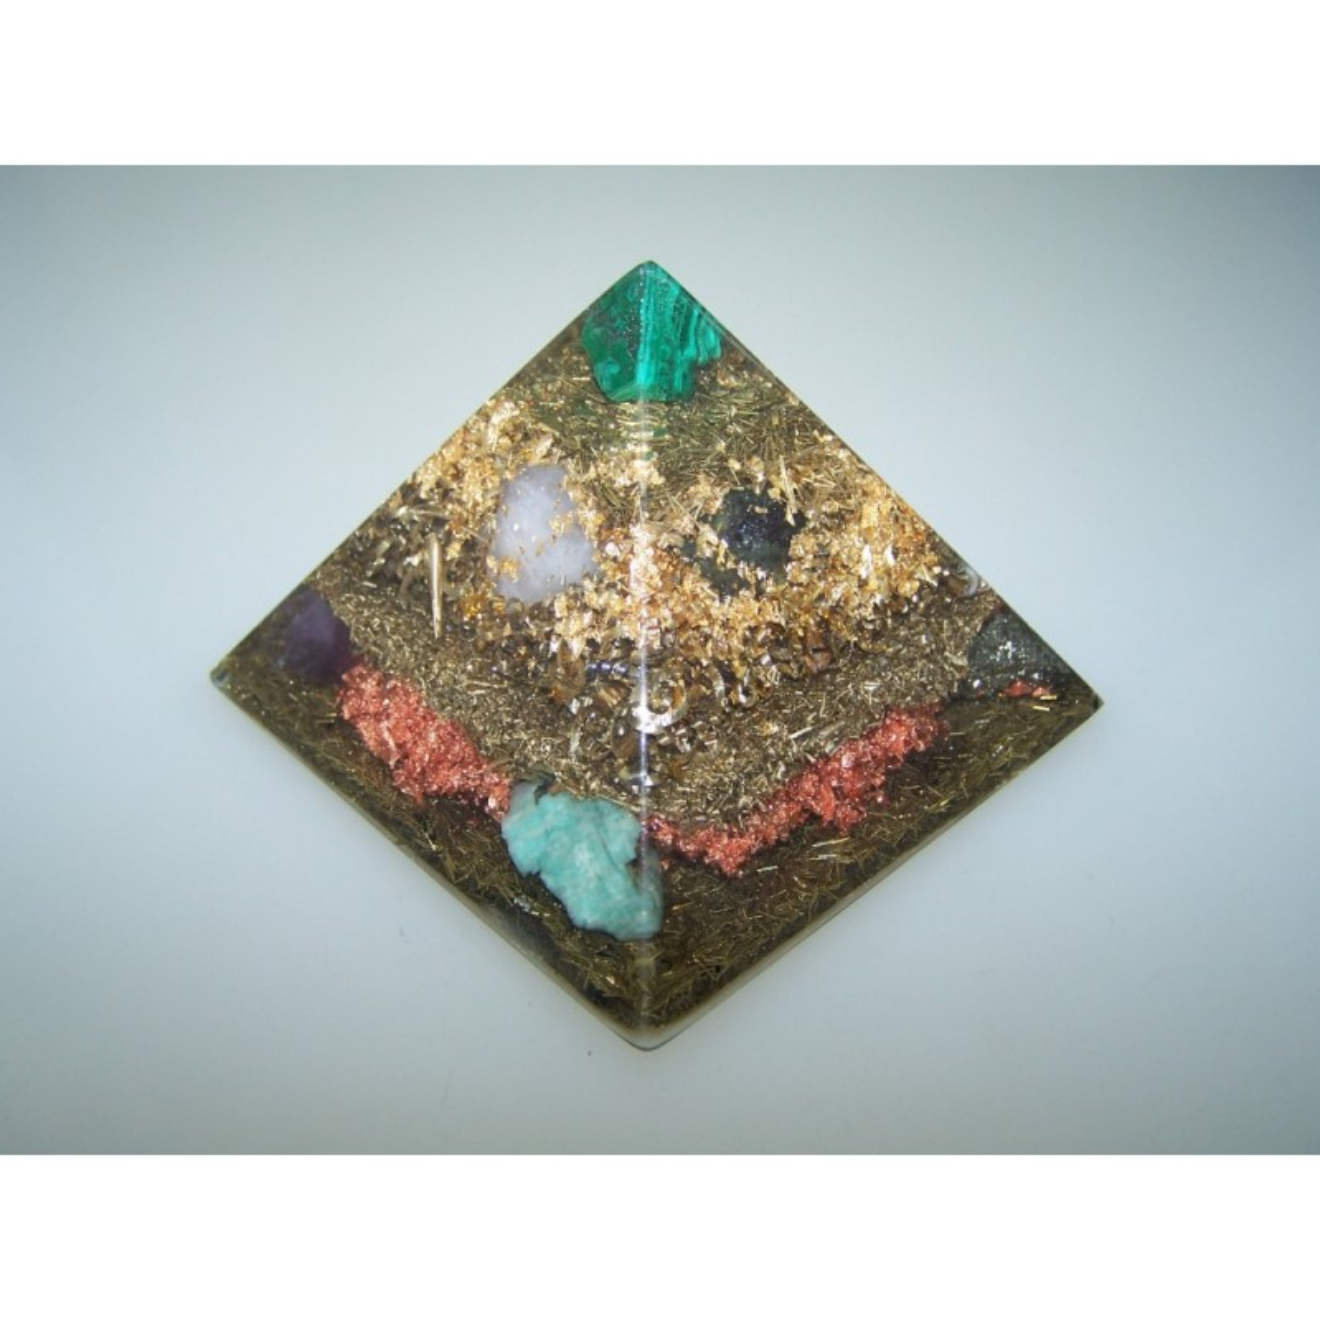 Orgon Orgonit Pyramide Blattgold Amethyst Lapis Schungit Turmalin Pyrit u.a